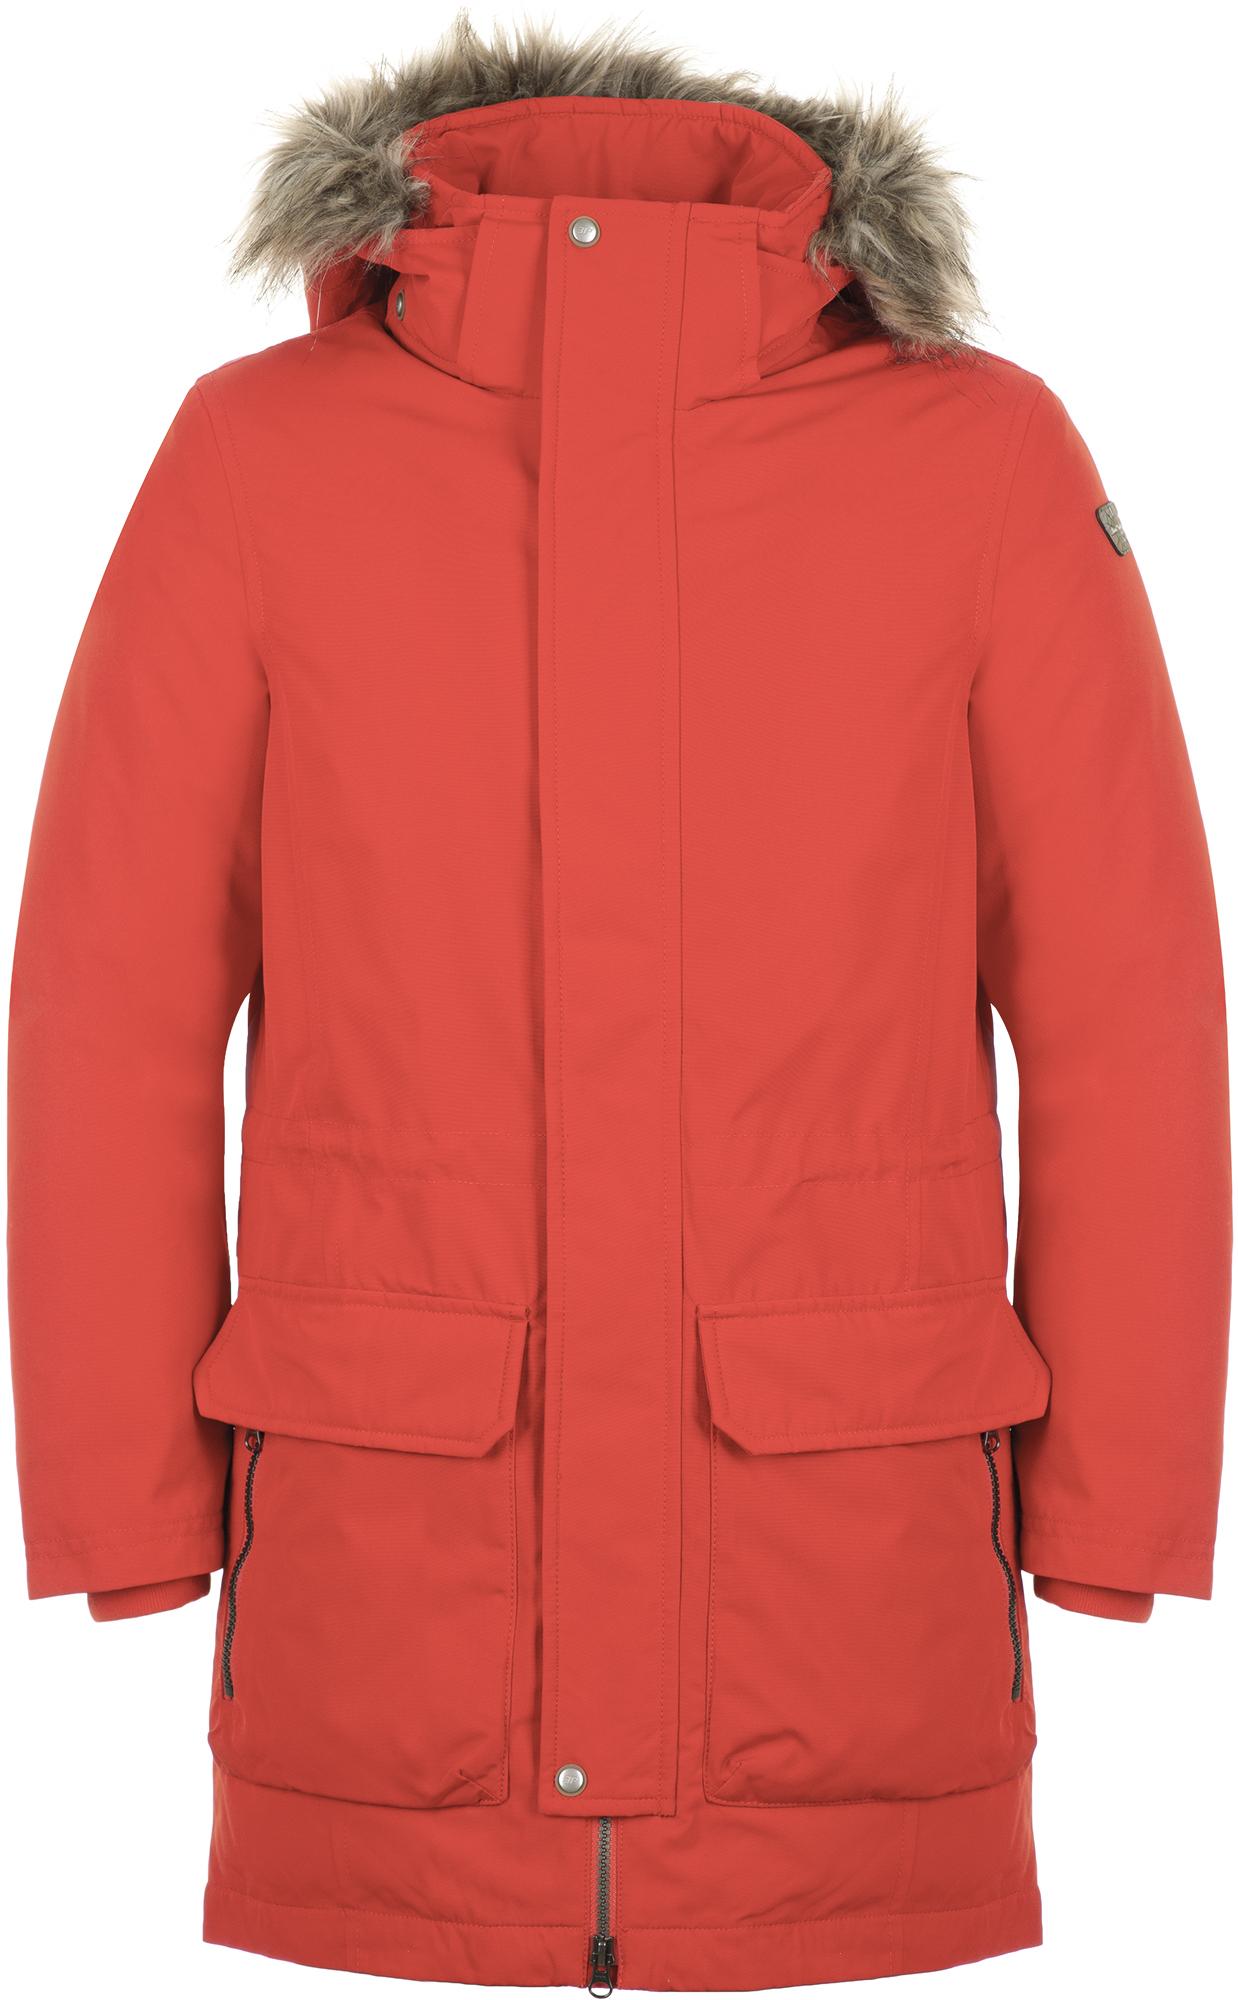 IcePeak Куртка утепленная мужская IcePeak Abington, размер 52